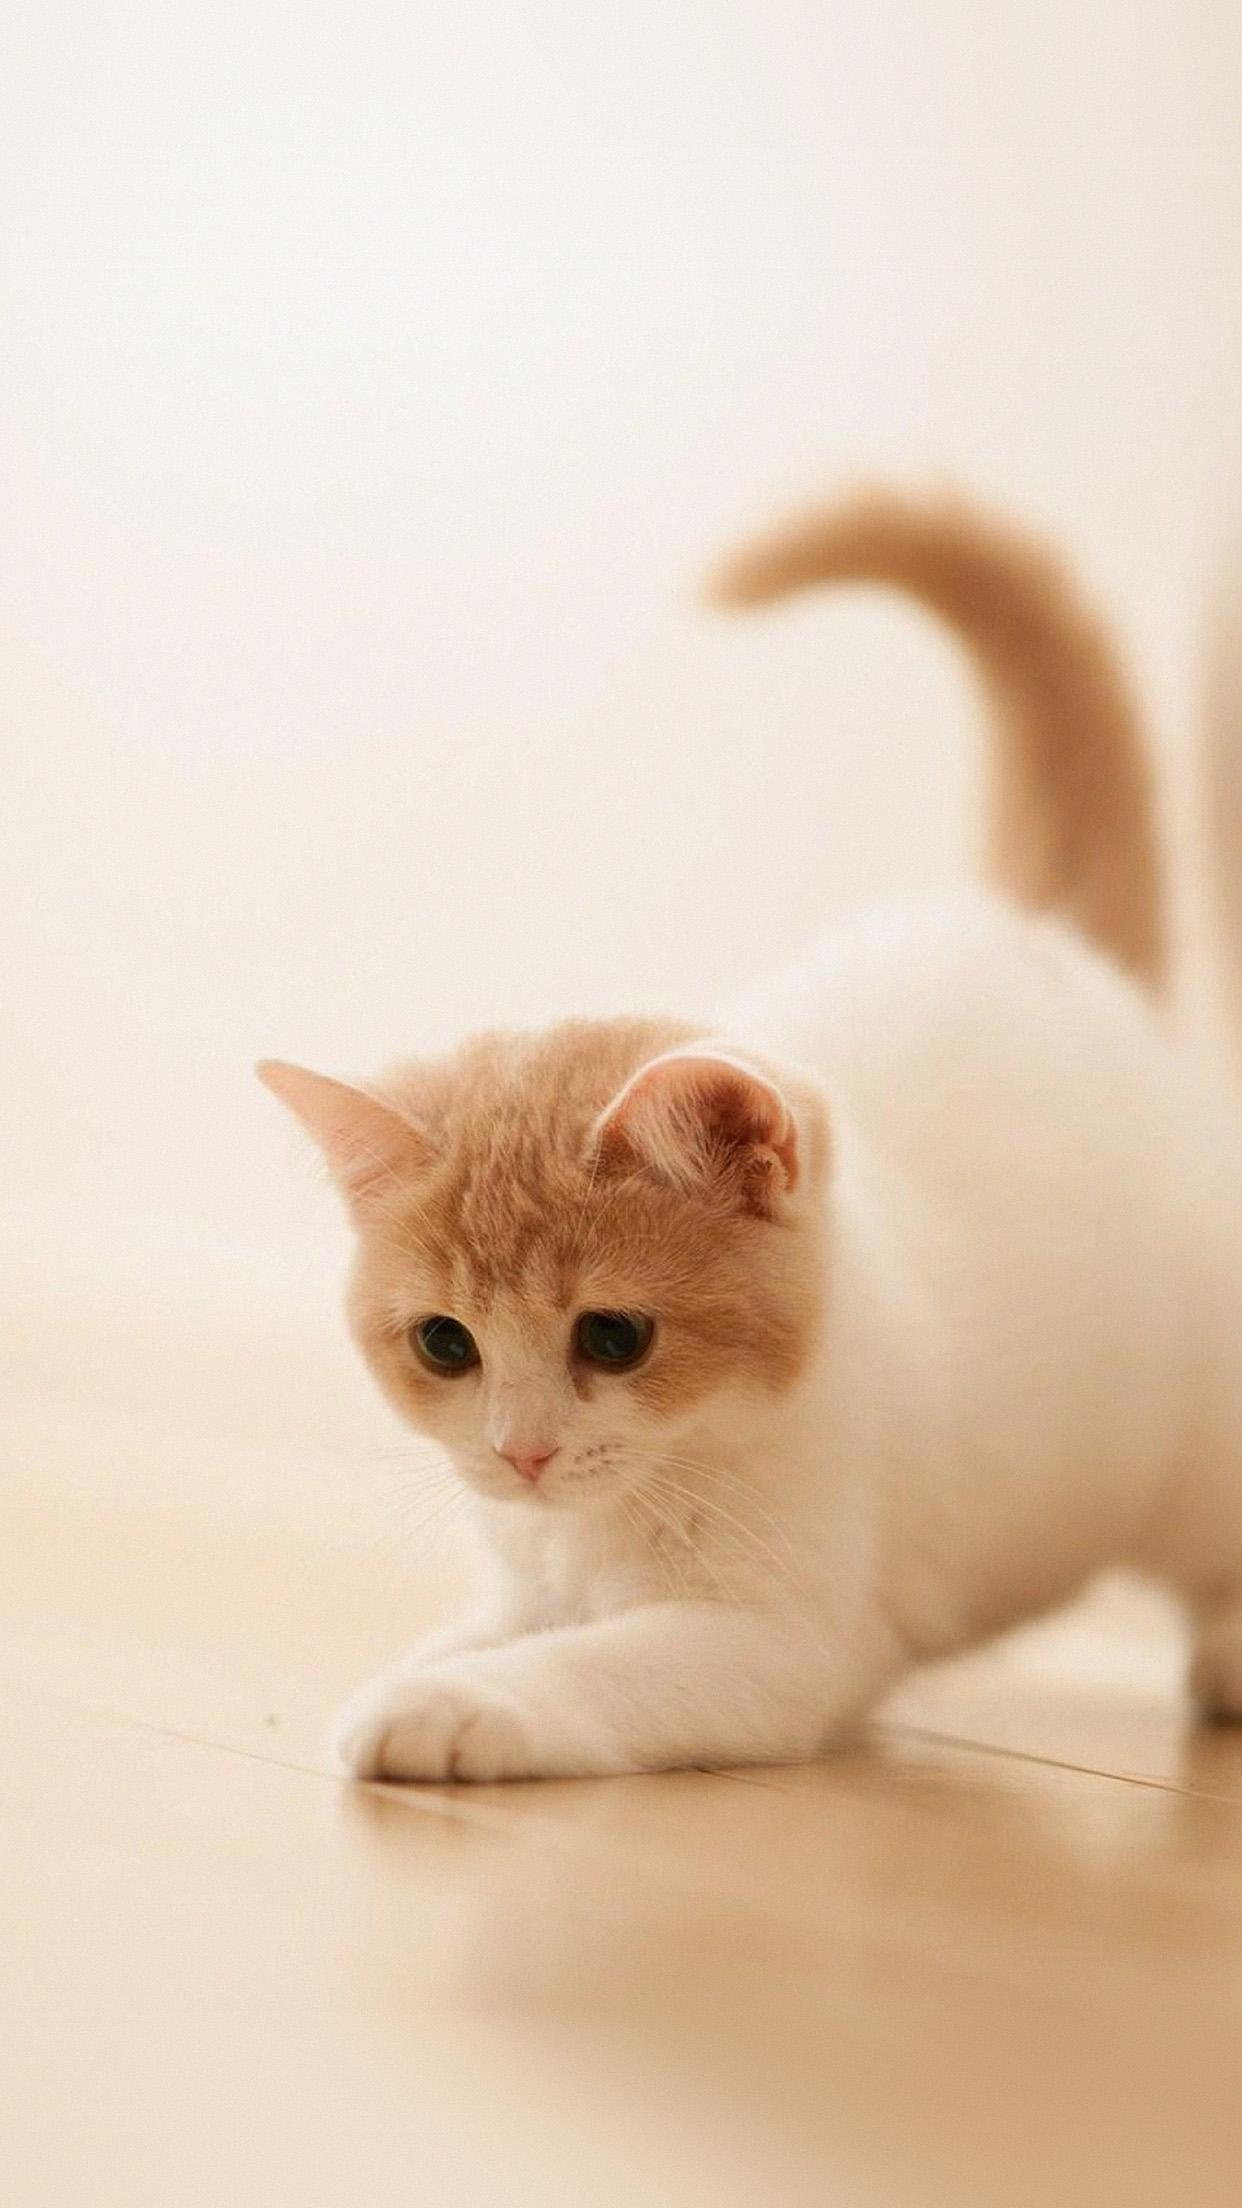 Iphone7paperscom Iphone7 Wallpaper Ap58 Cute Cat Kitten Animal